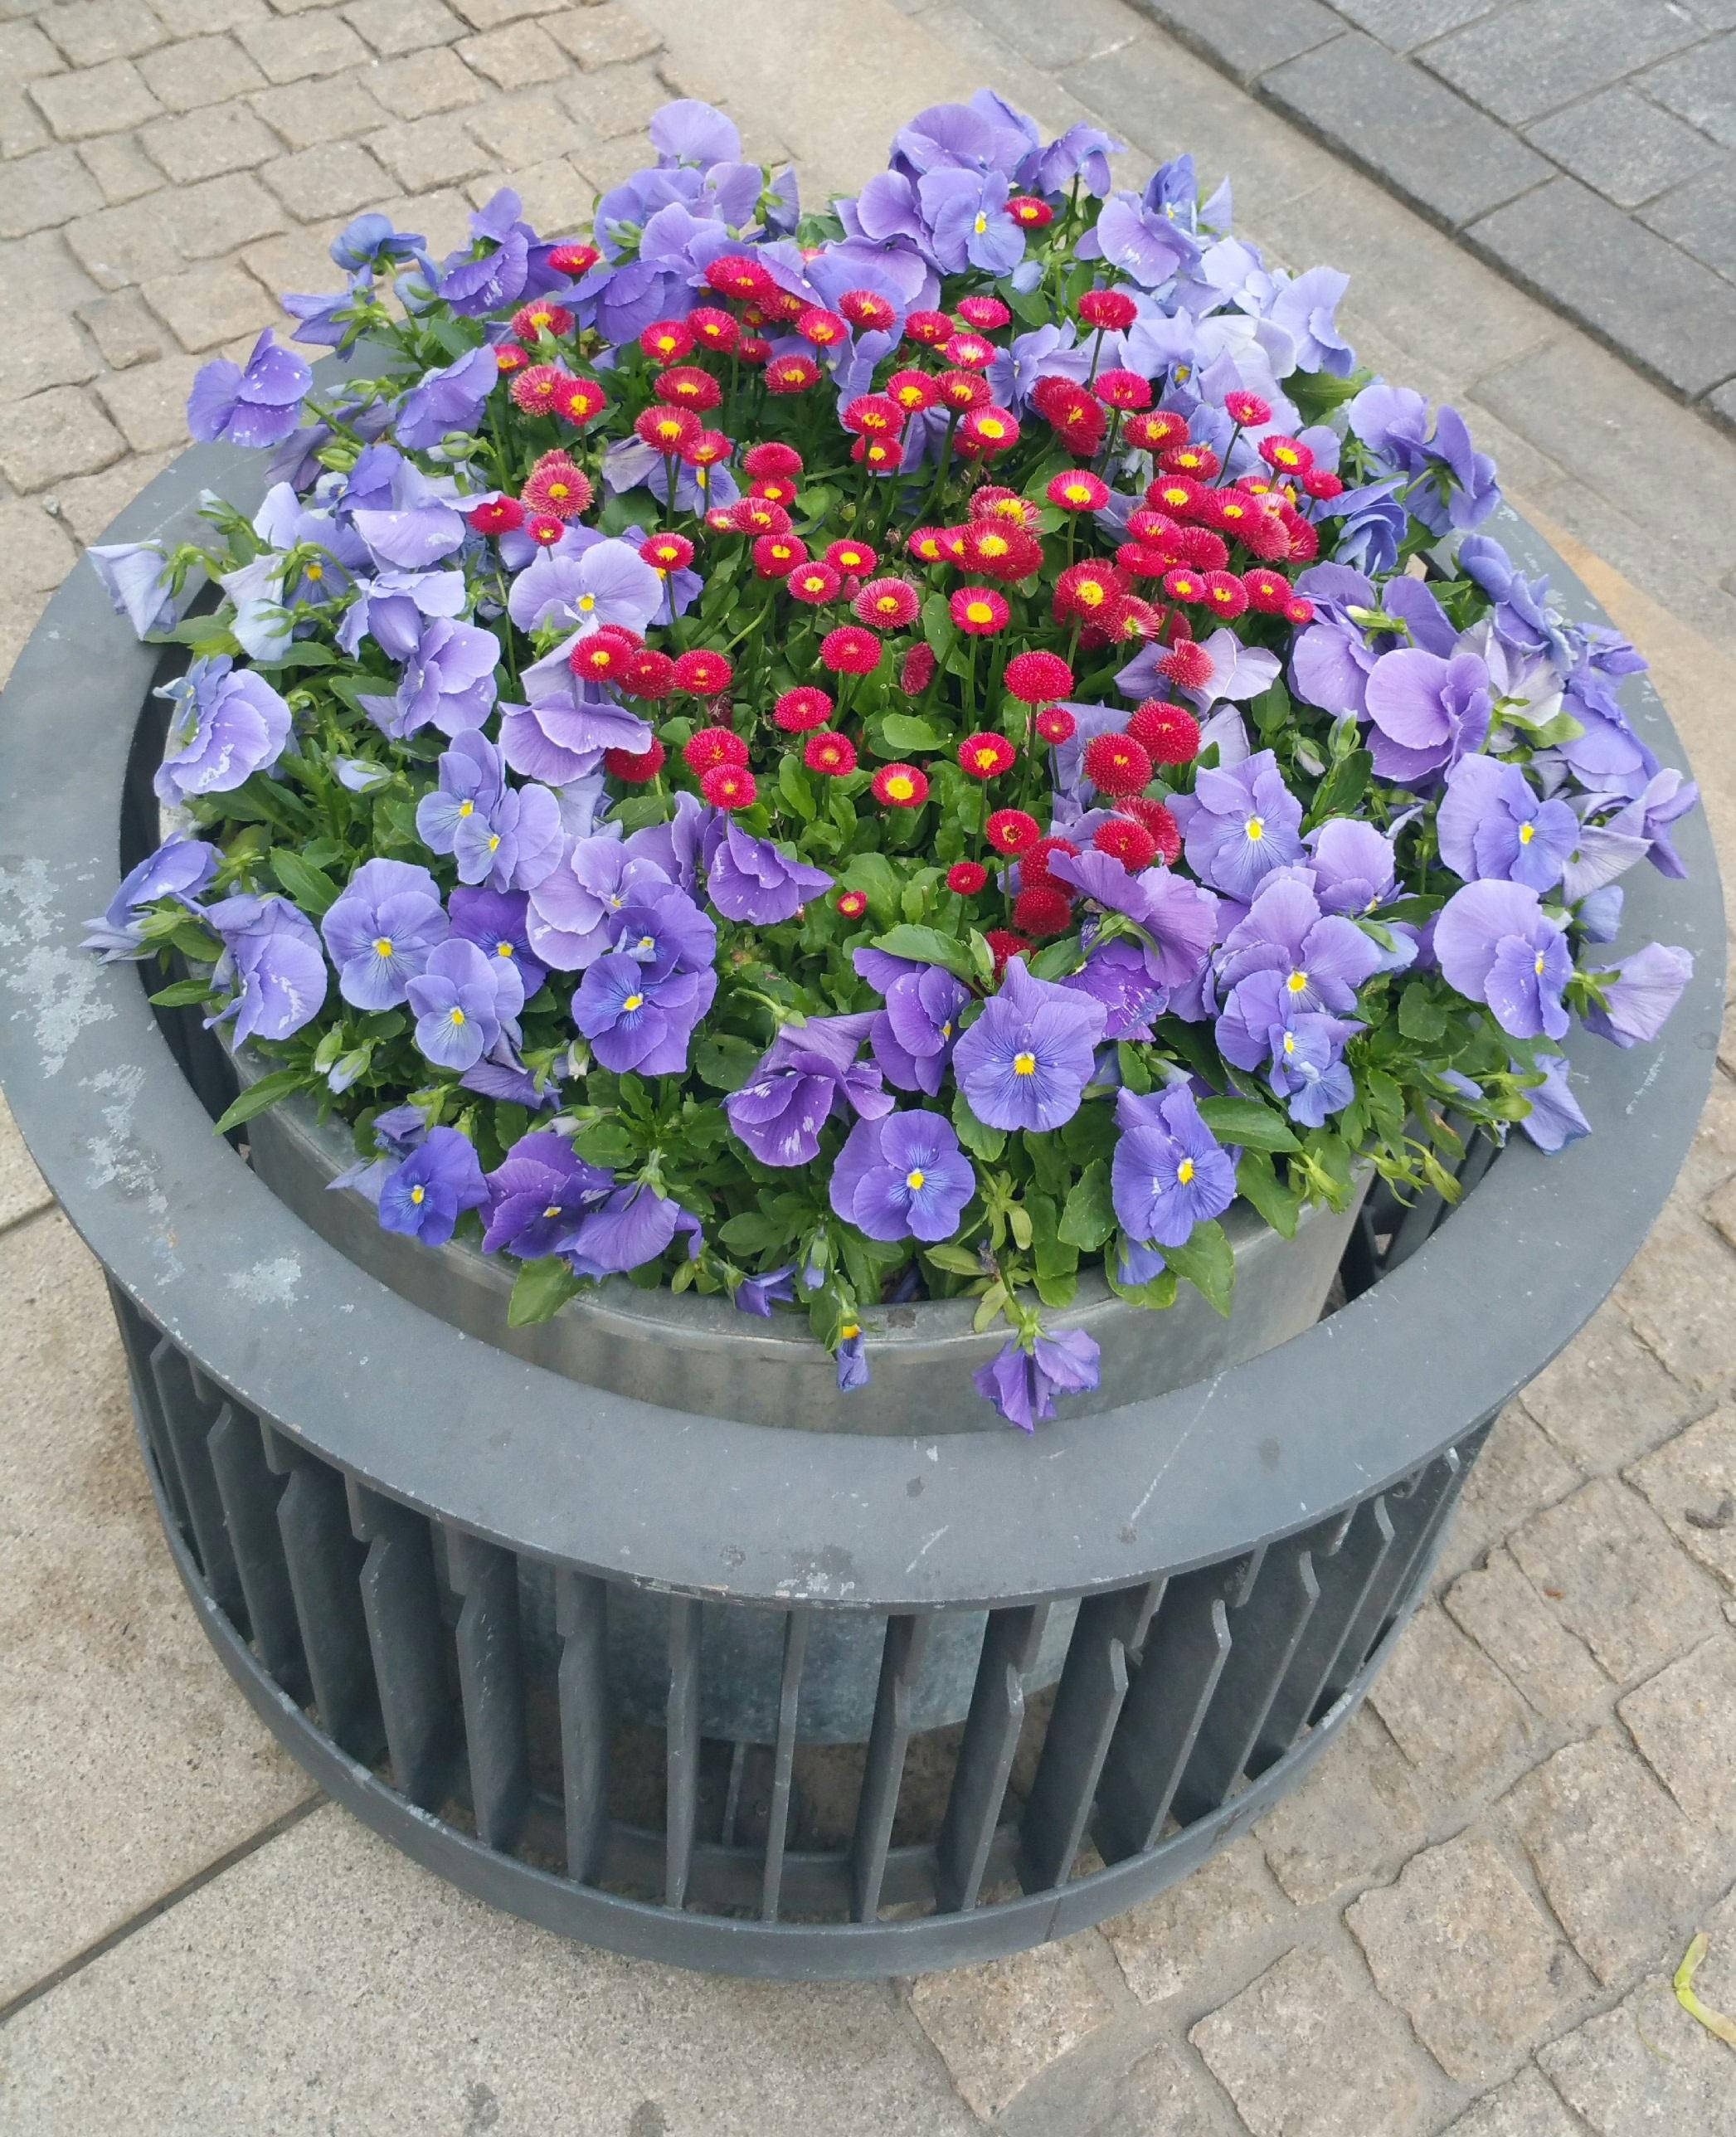 Fotos Gratis Flor Pétalo Florero Arreglo Floral Flores